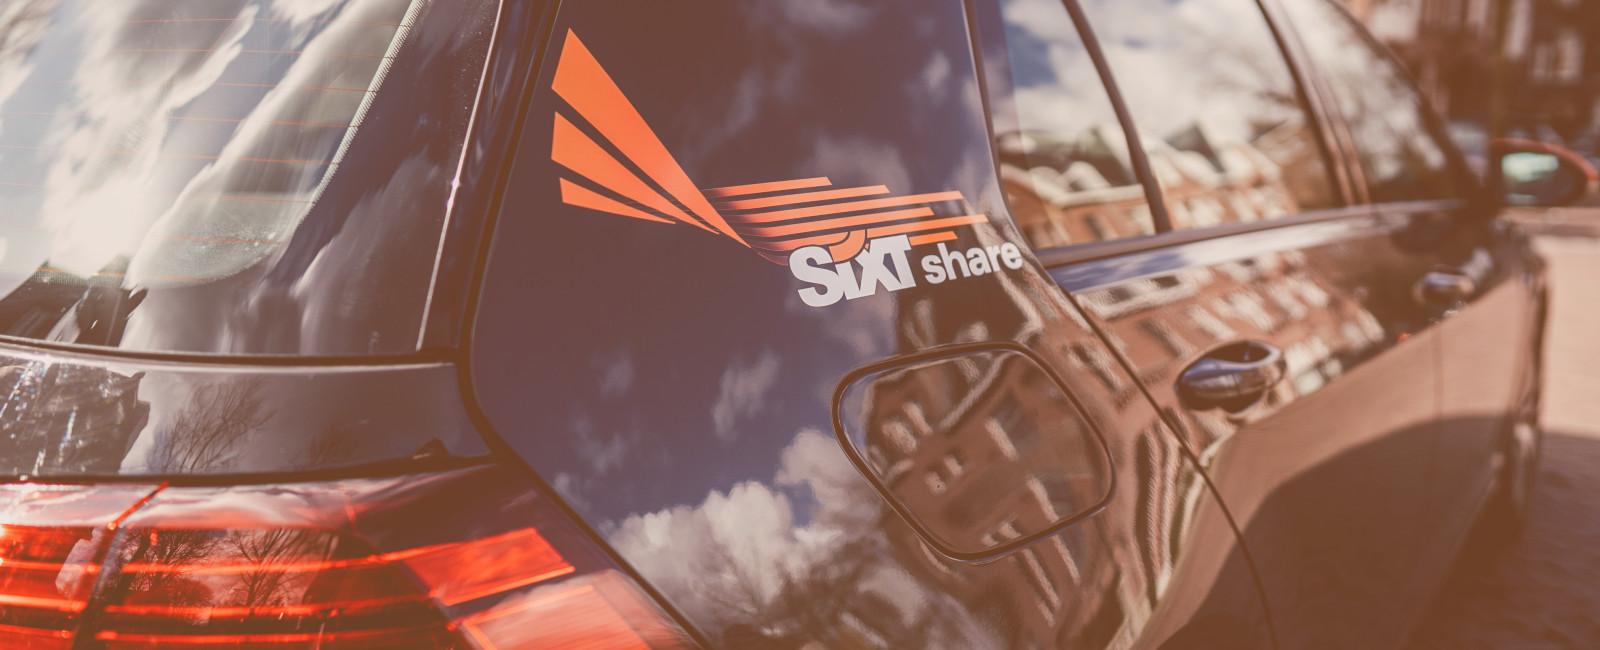 sixt share carsharing vloot